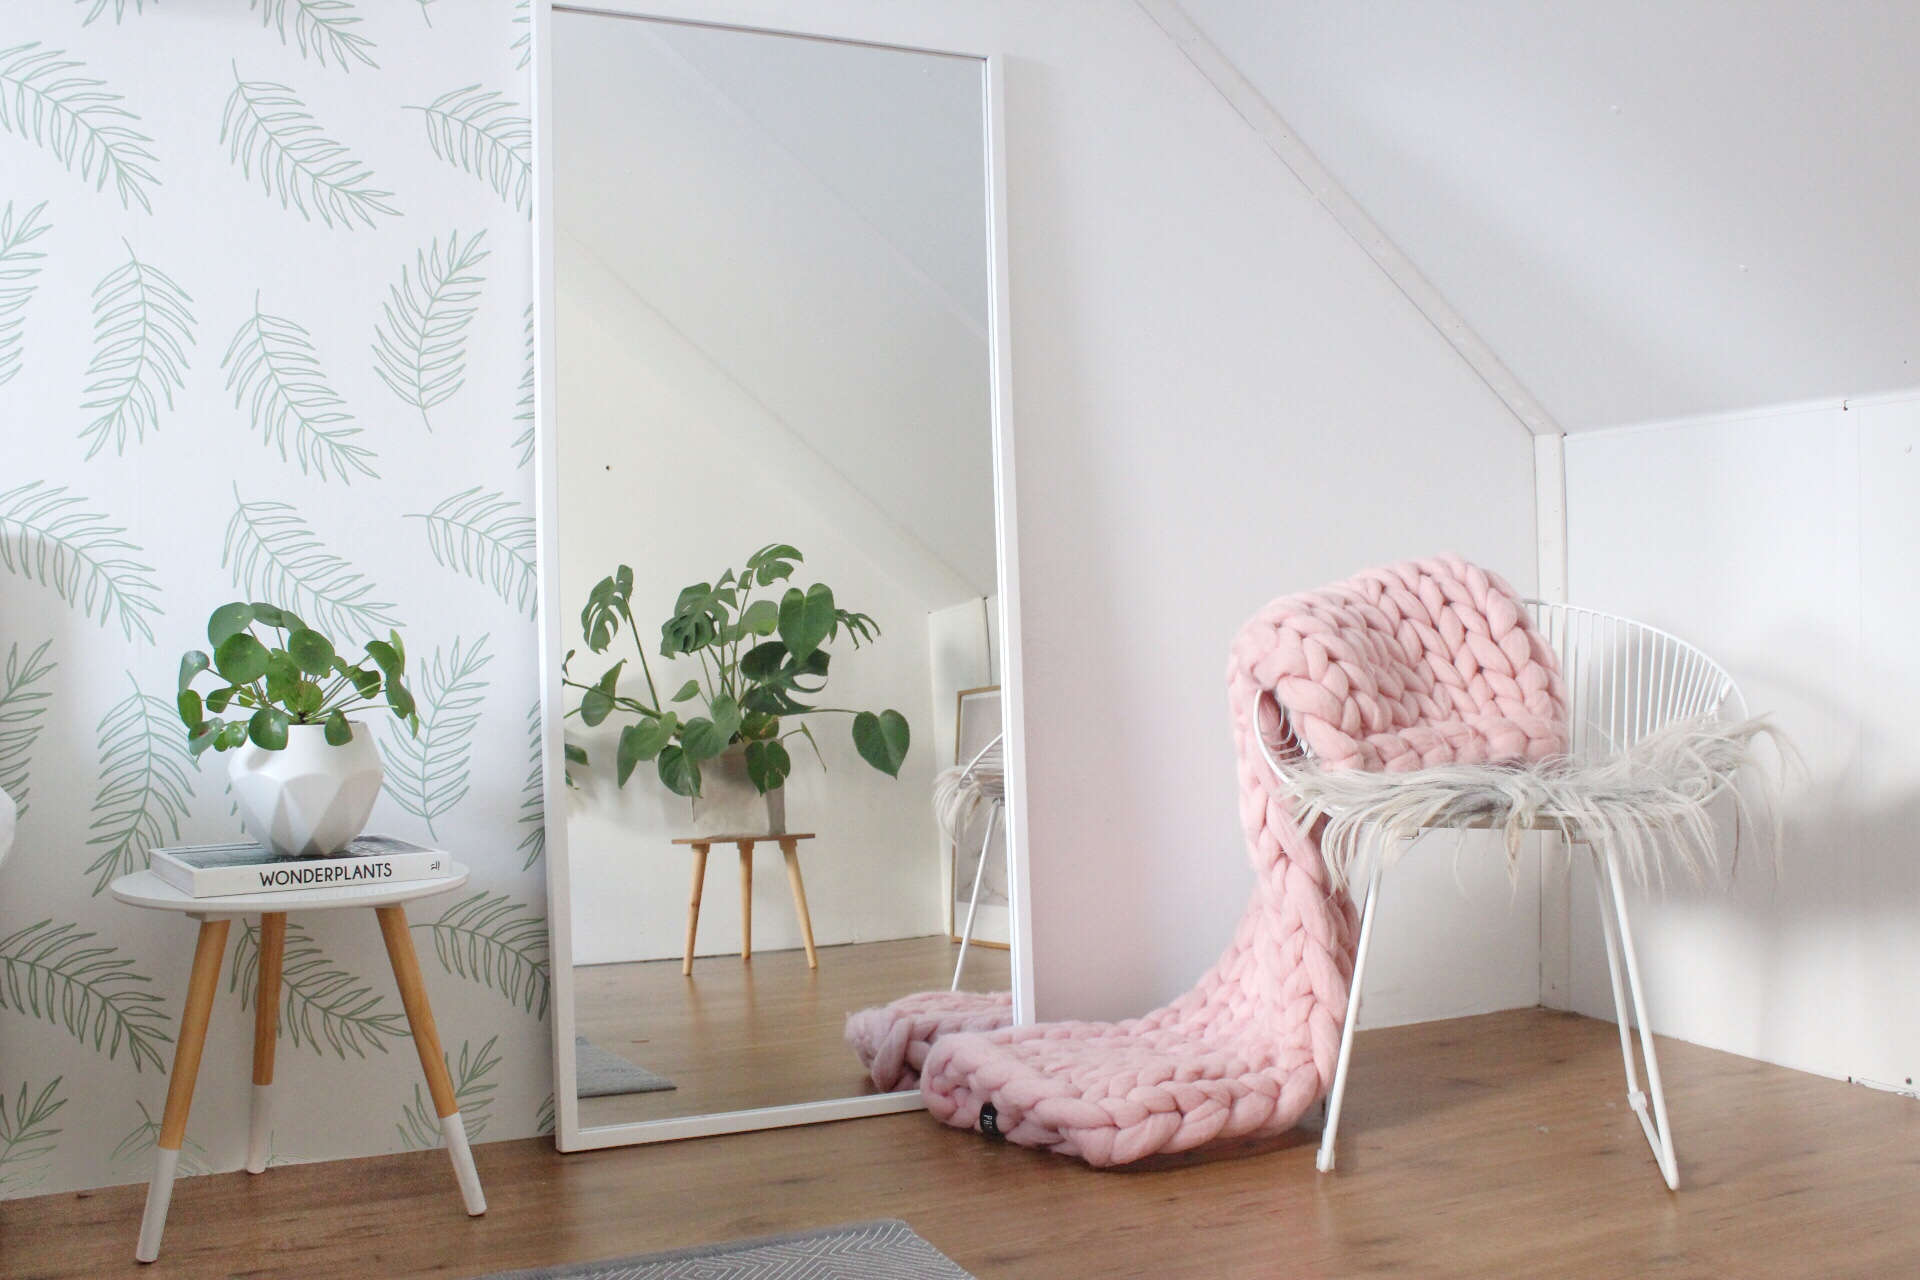 Awesome Leuk Behang Voor Slaapkamer Contemporary - Huis & Interieur ...